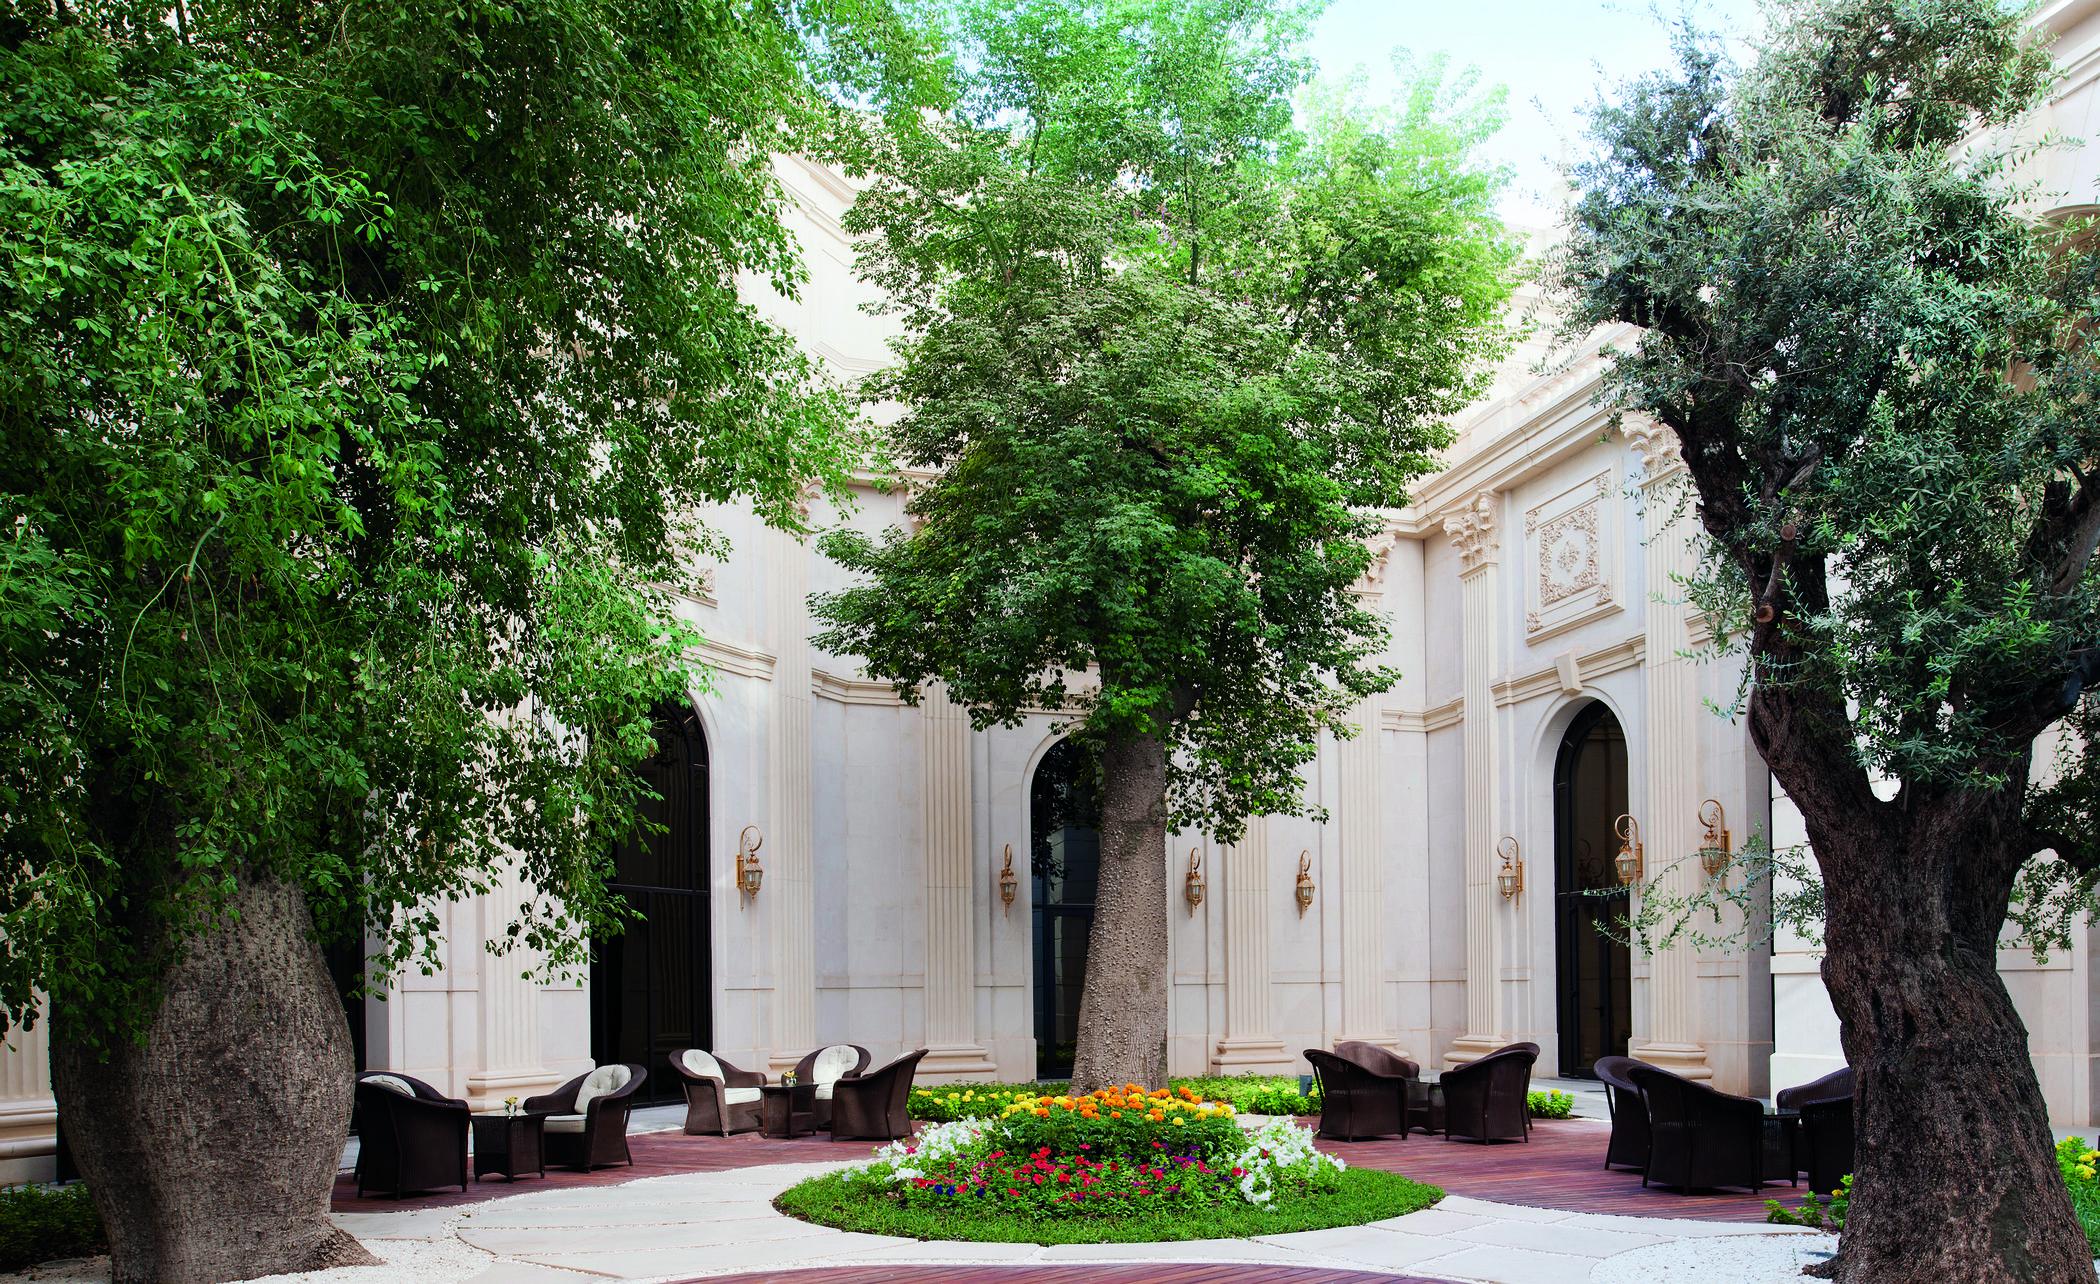 Luxury Riyadh Hotels Luxury Hotels In Saudi Arabia Ritz Carlton Hotels And Resorts Ritz Carlton Hotel